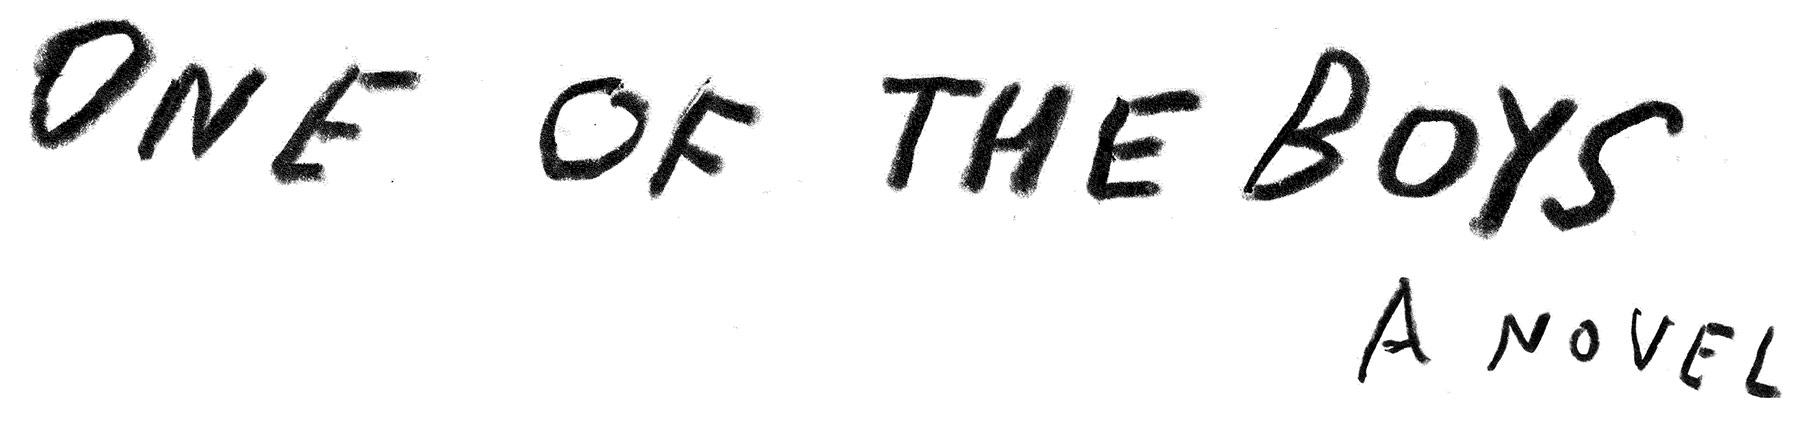 OneOfTheBoys_HandwrittenTitle.jpg